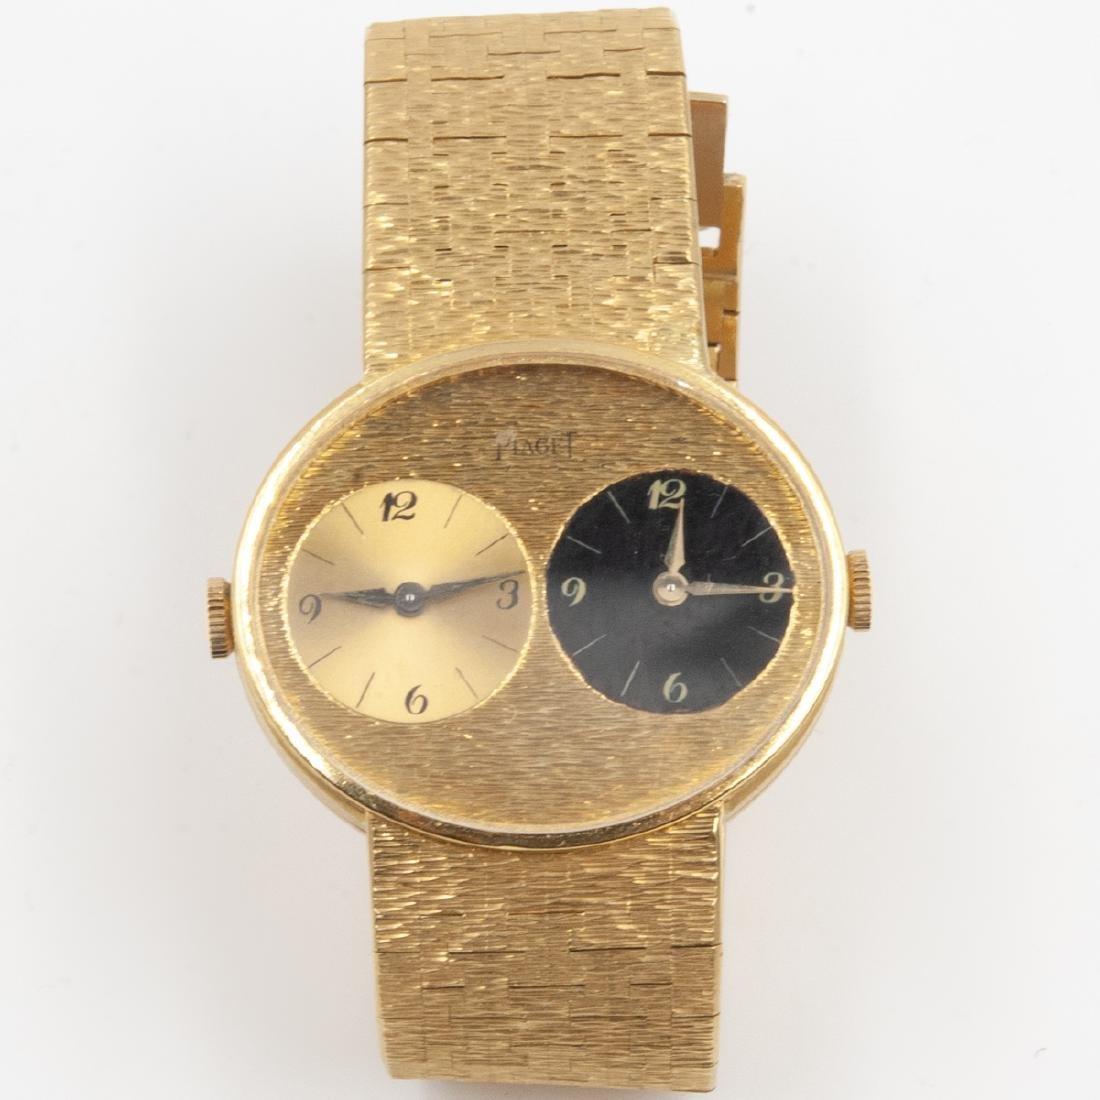 Vintage Piaget dual time watch - 2